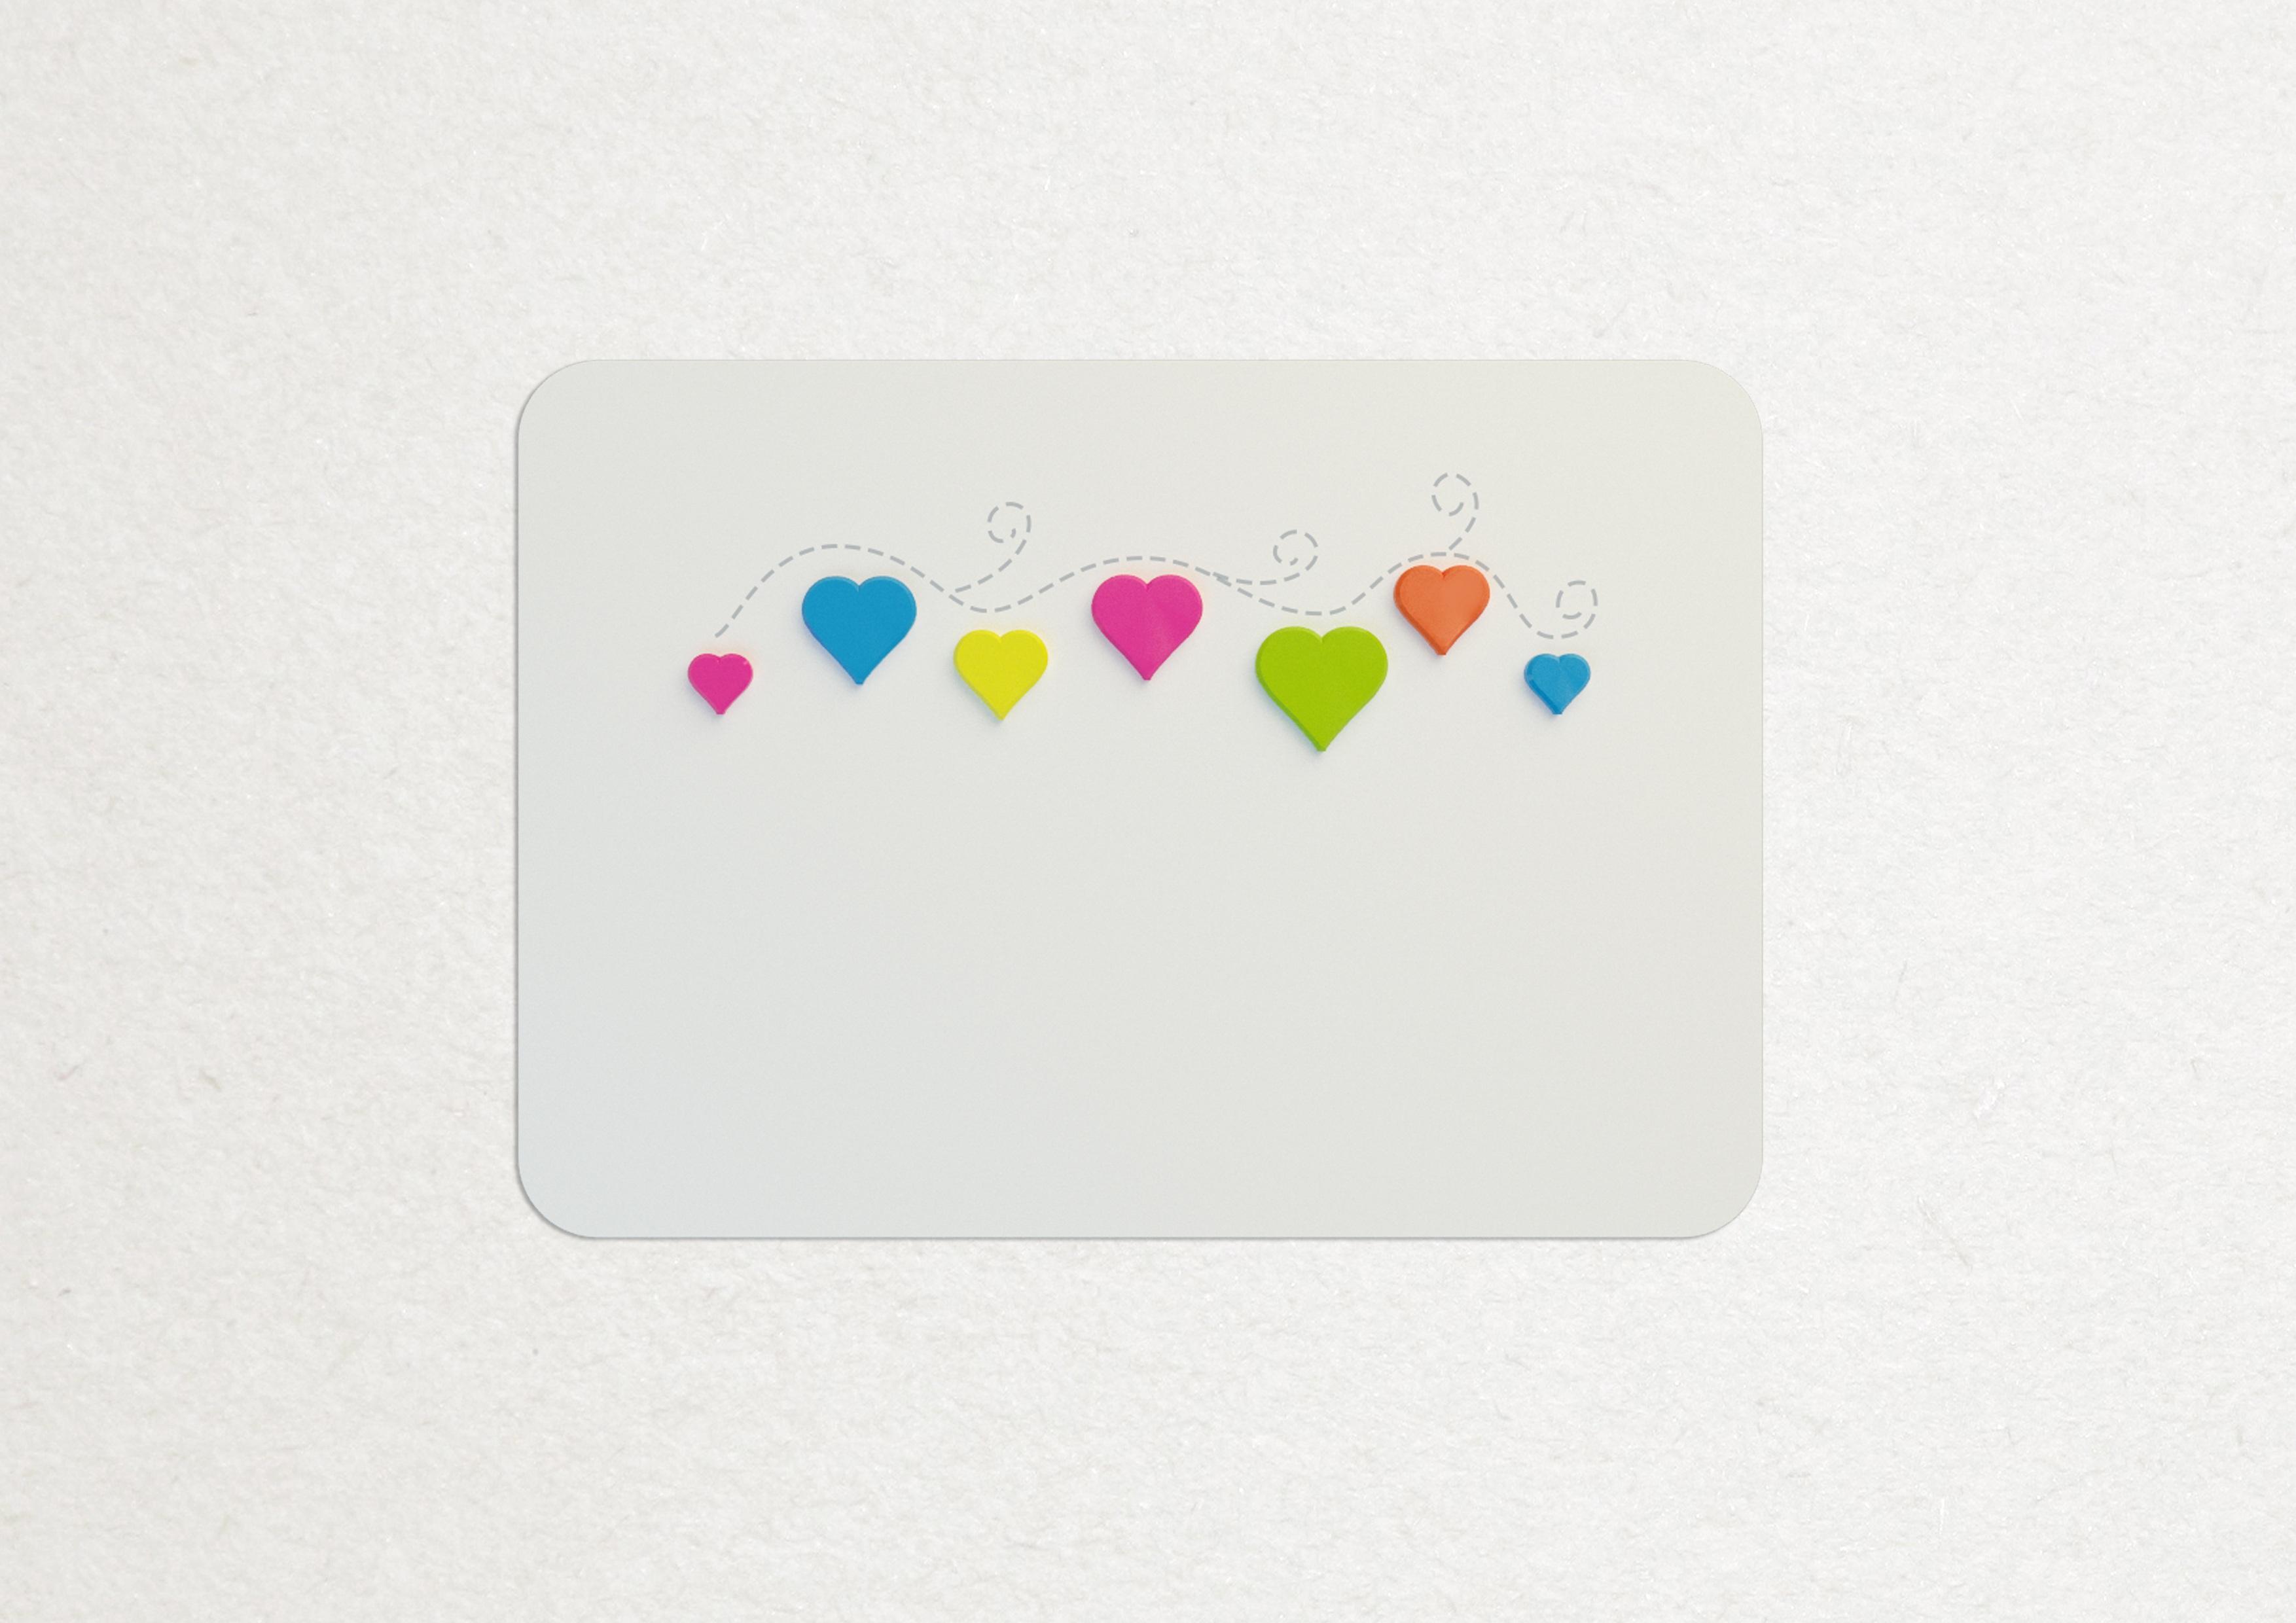 dating site houkuttelevin